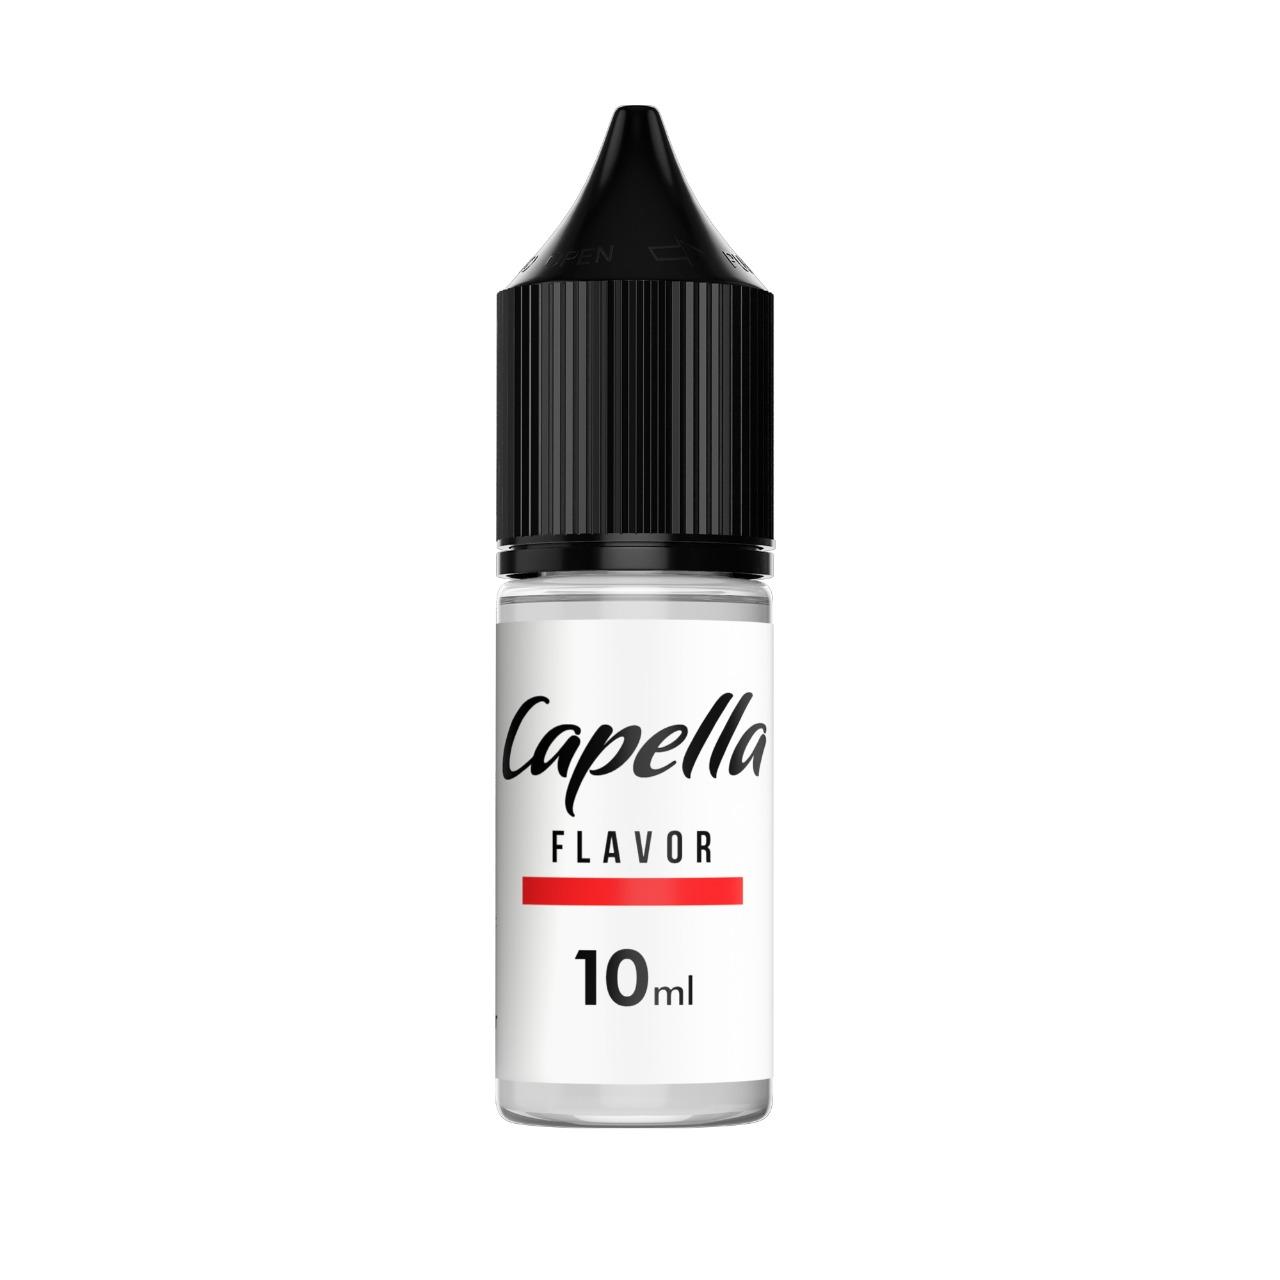 Capella (CAP) Blackberry v2 15ml